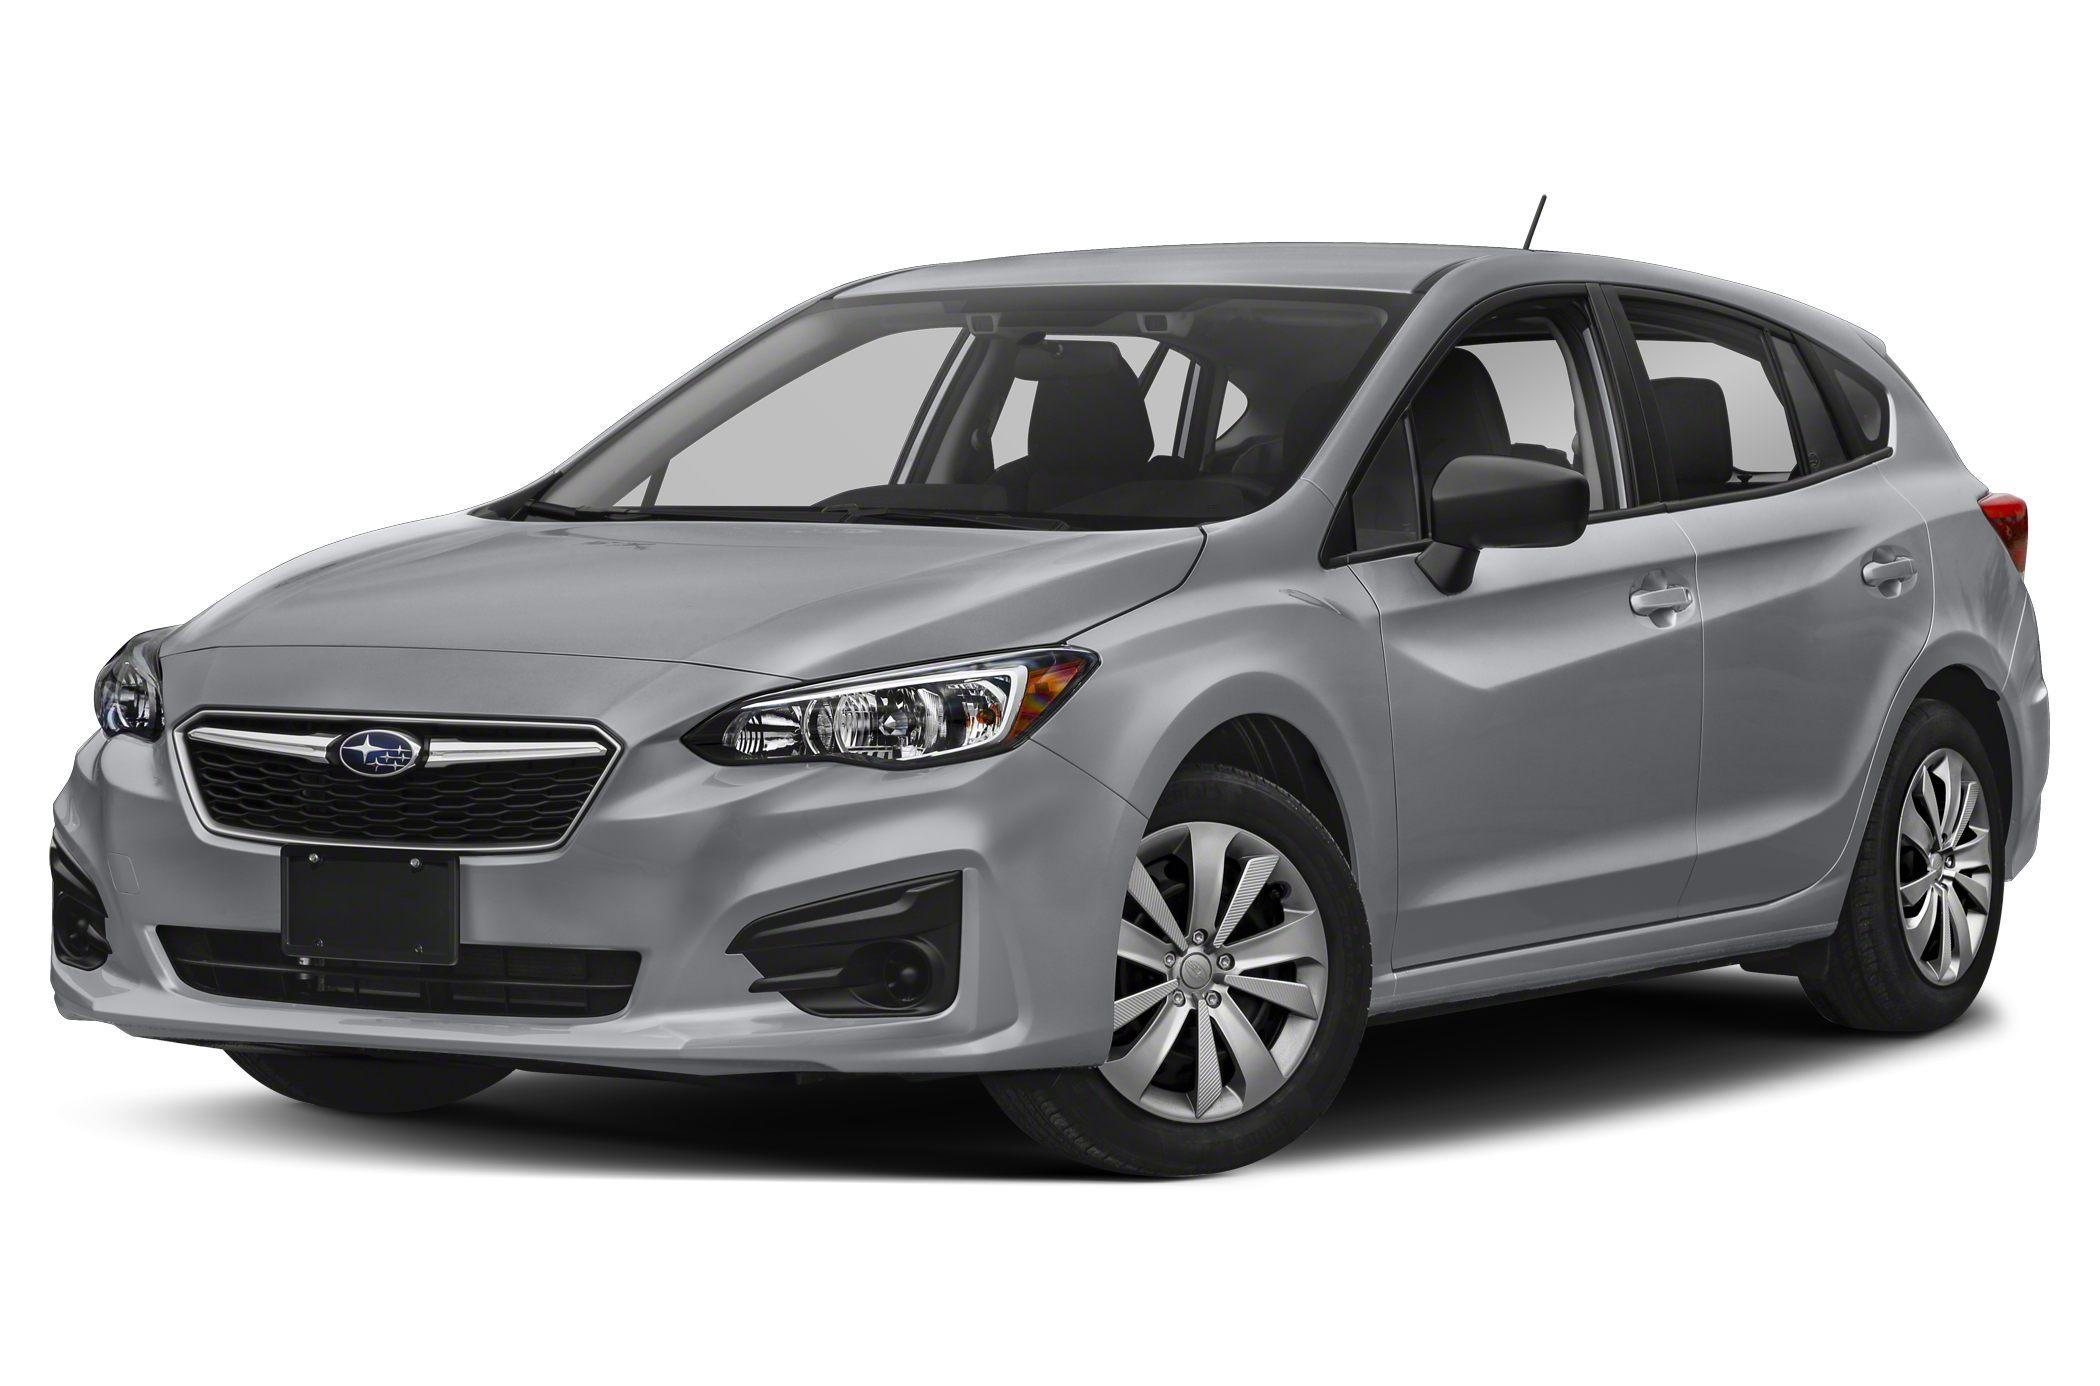 2019 Subaru Impreza 2.0i Premium 4dr All-wheel Drive Hatchback